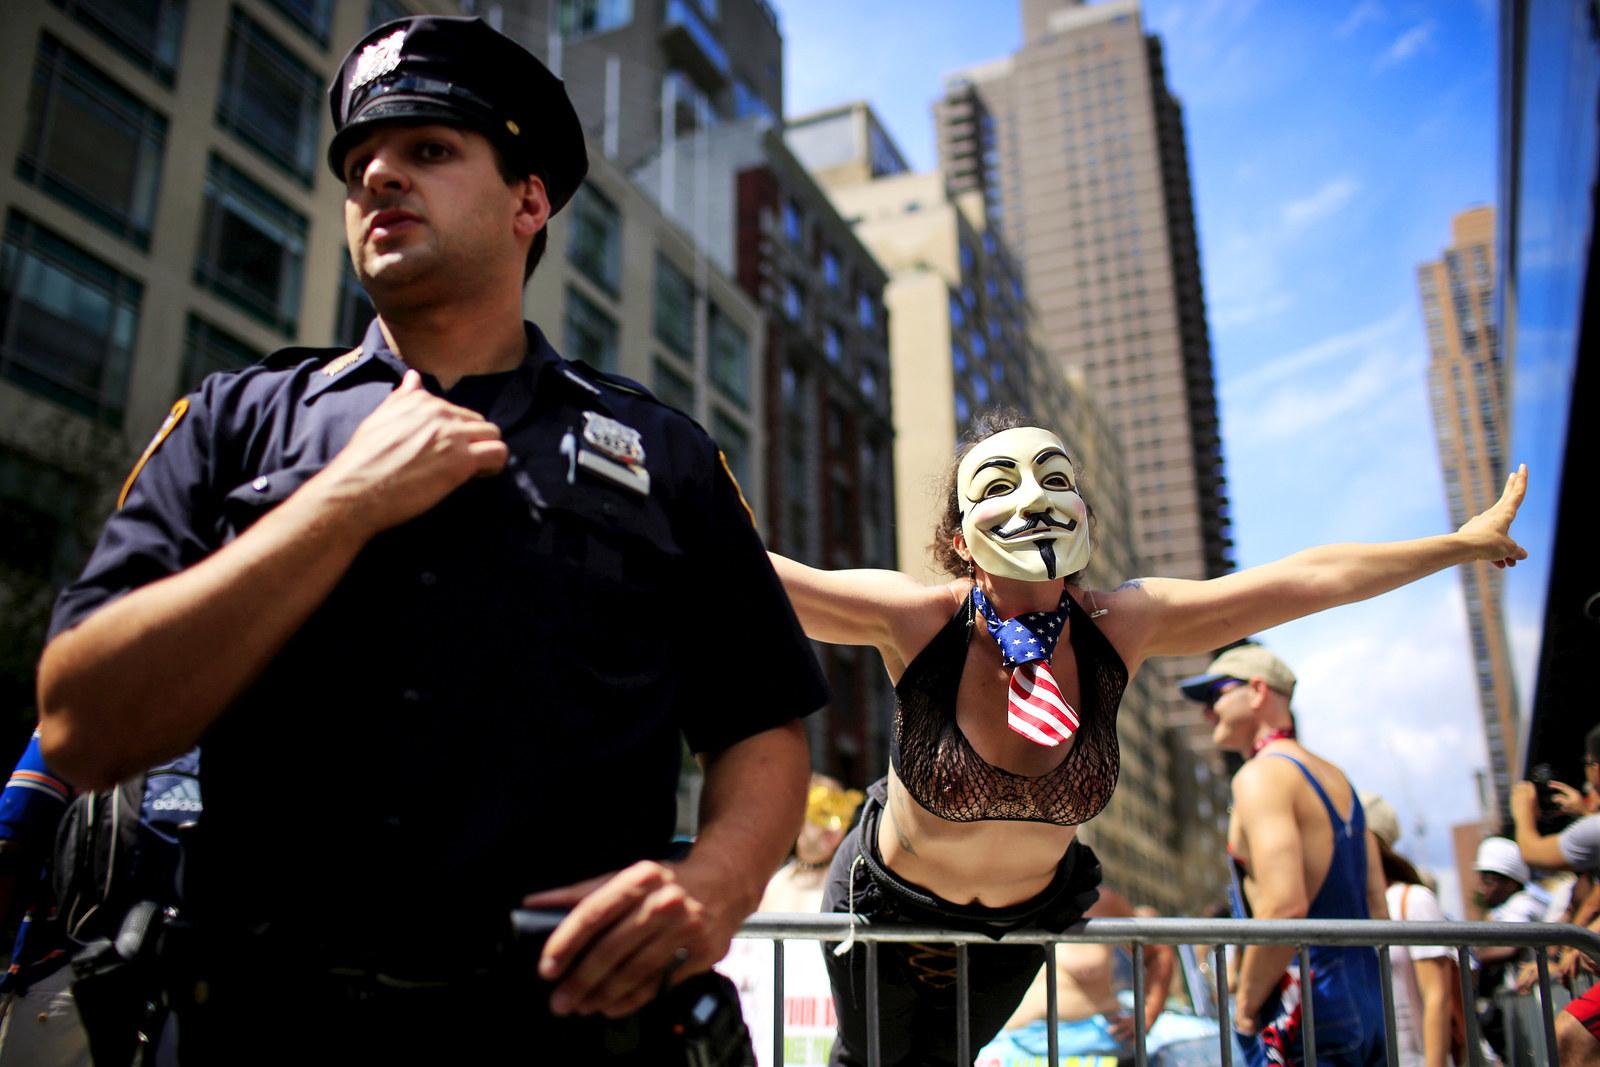 Bdsm, Kink And Feminism In Brooklyn, Nyc